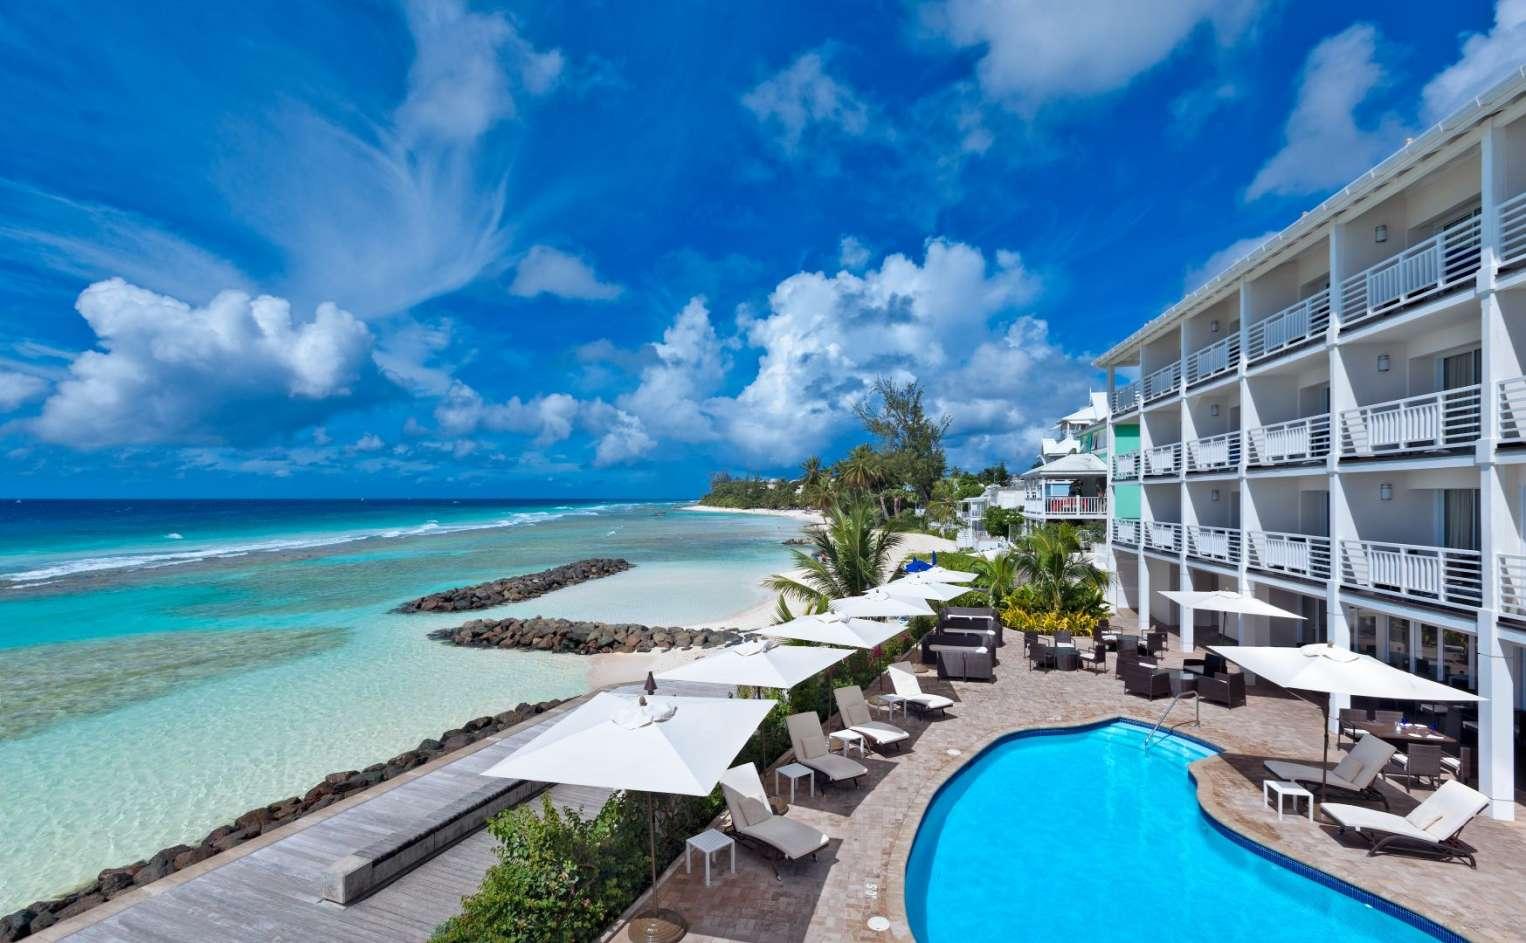 The SoCo Hotel, Christ Church, Barbados